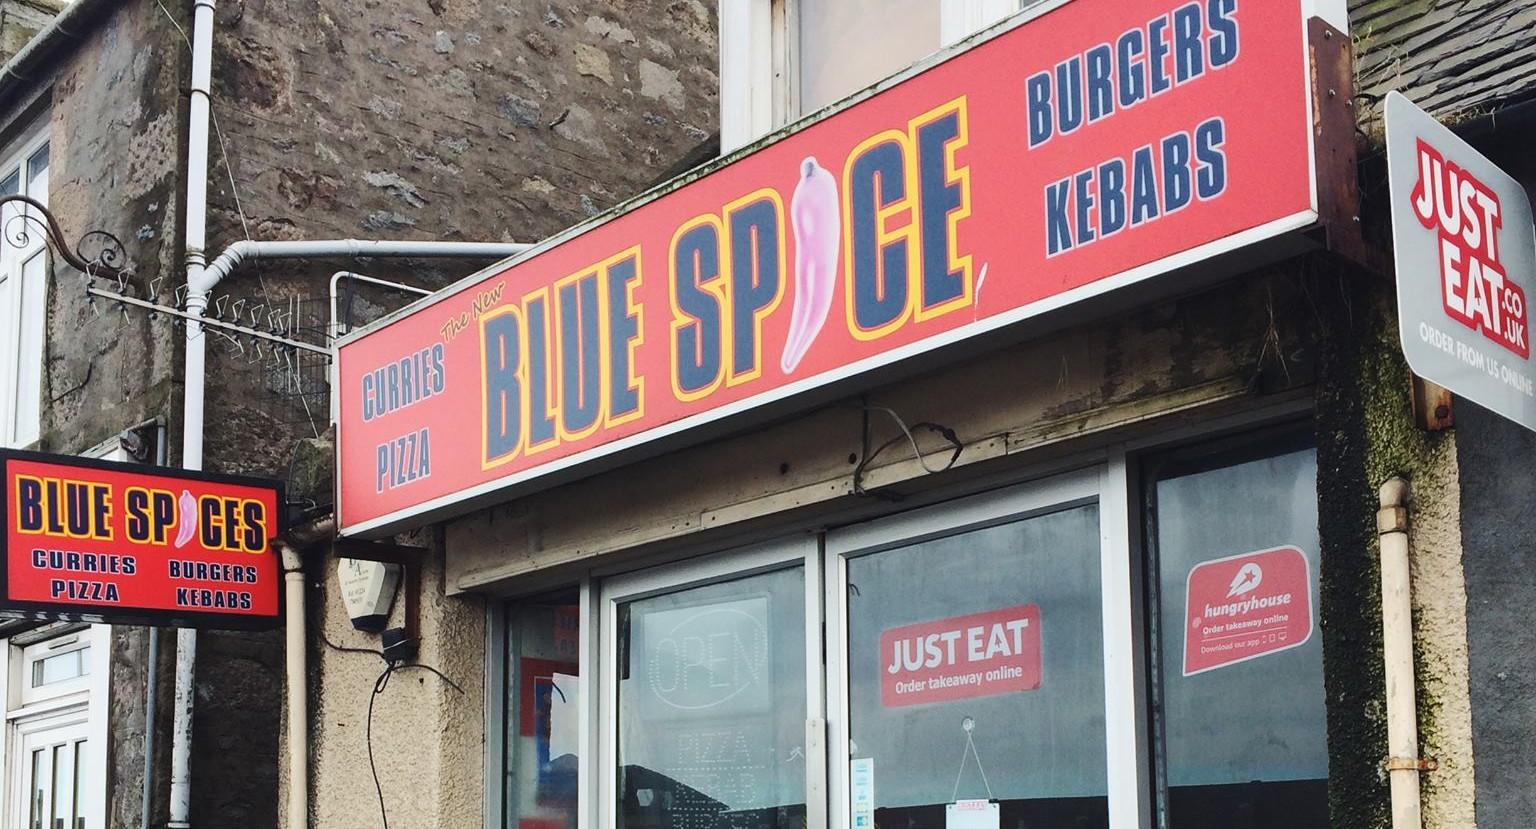 just eat royal spice edinburgh